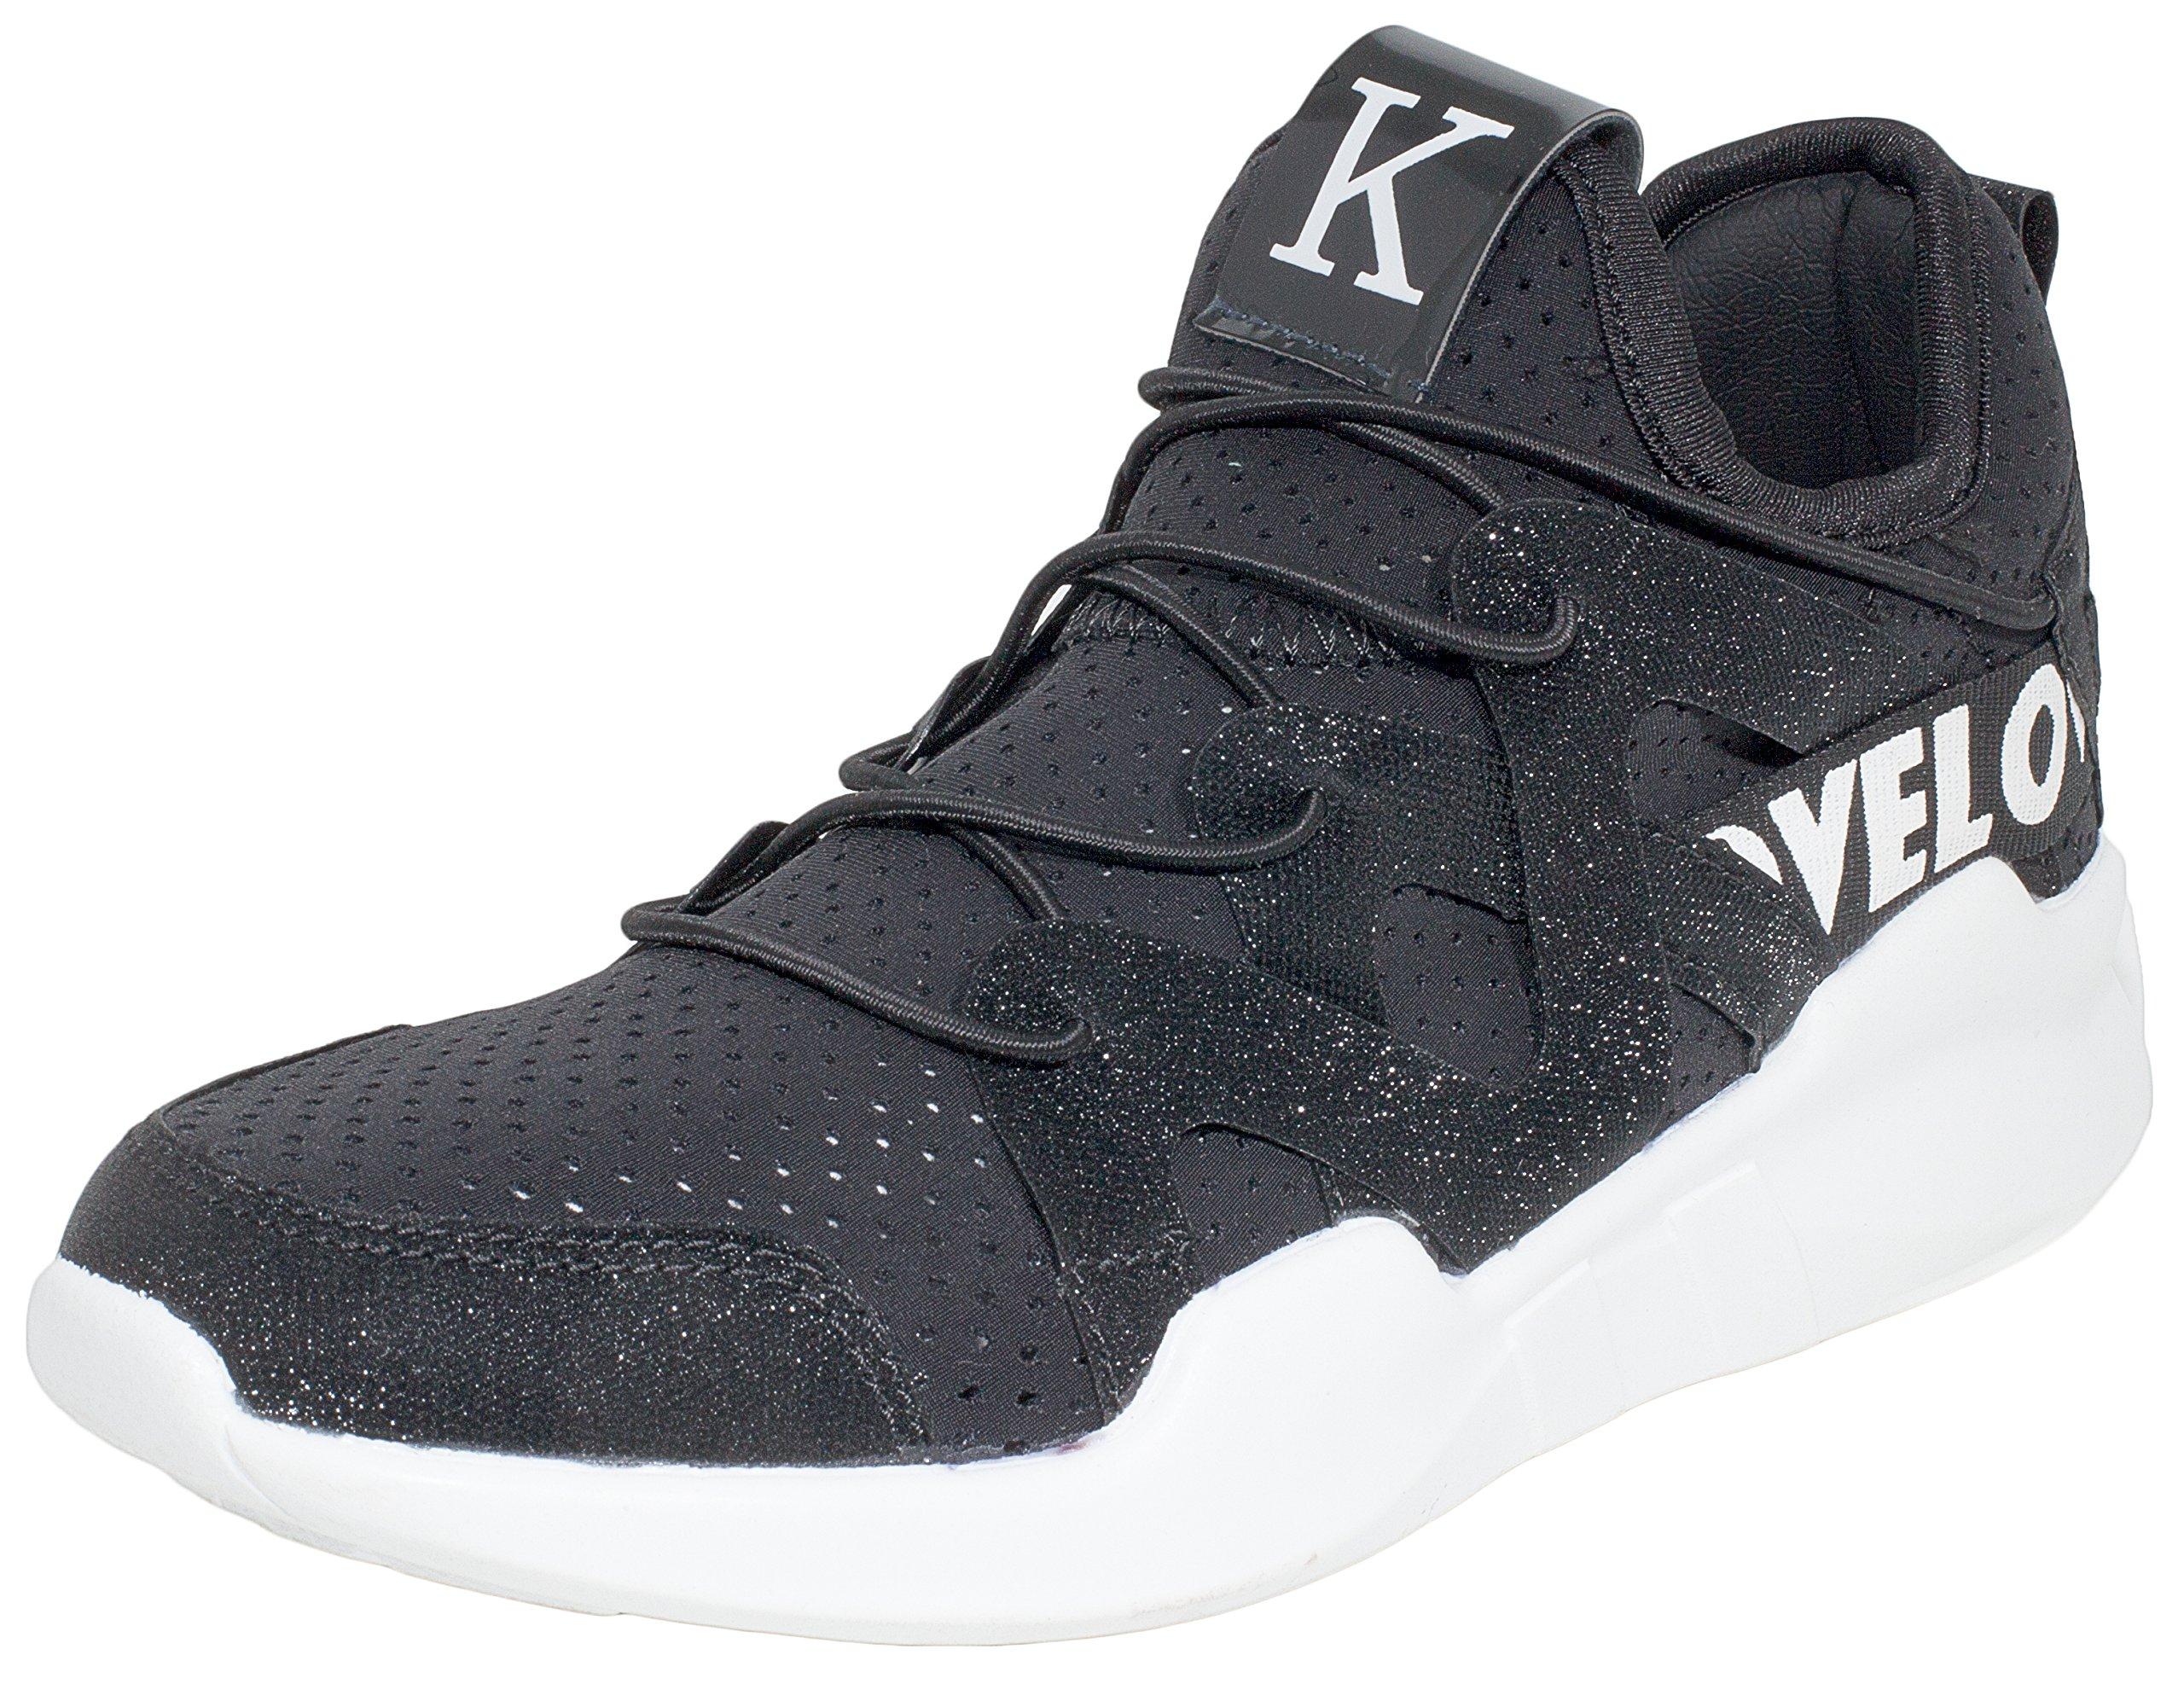 Eureka USA K. Love Sneaker @KathrynShowroom - Unisex